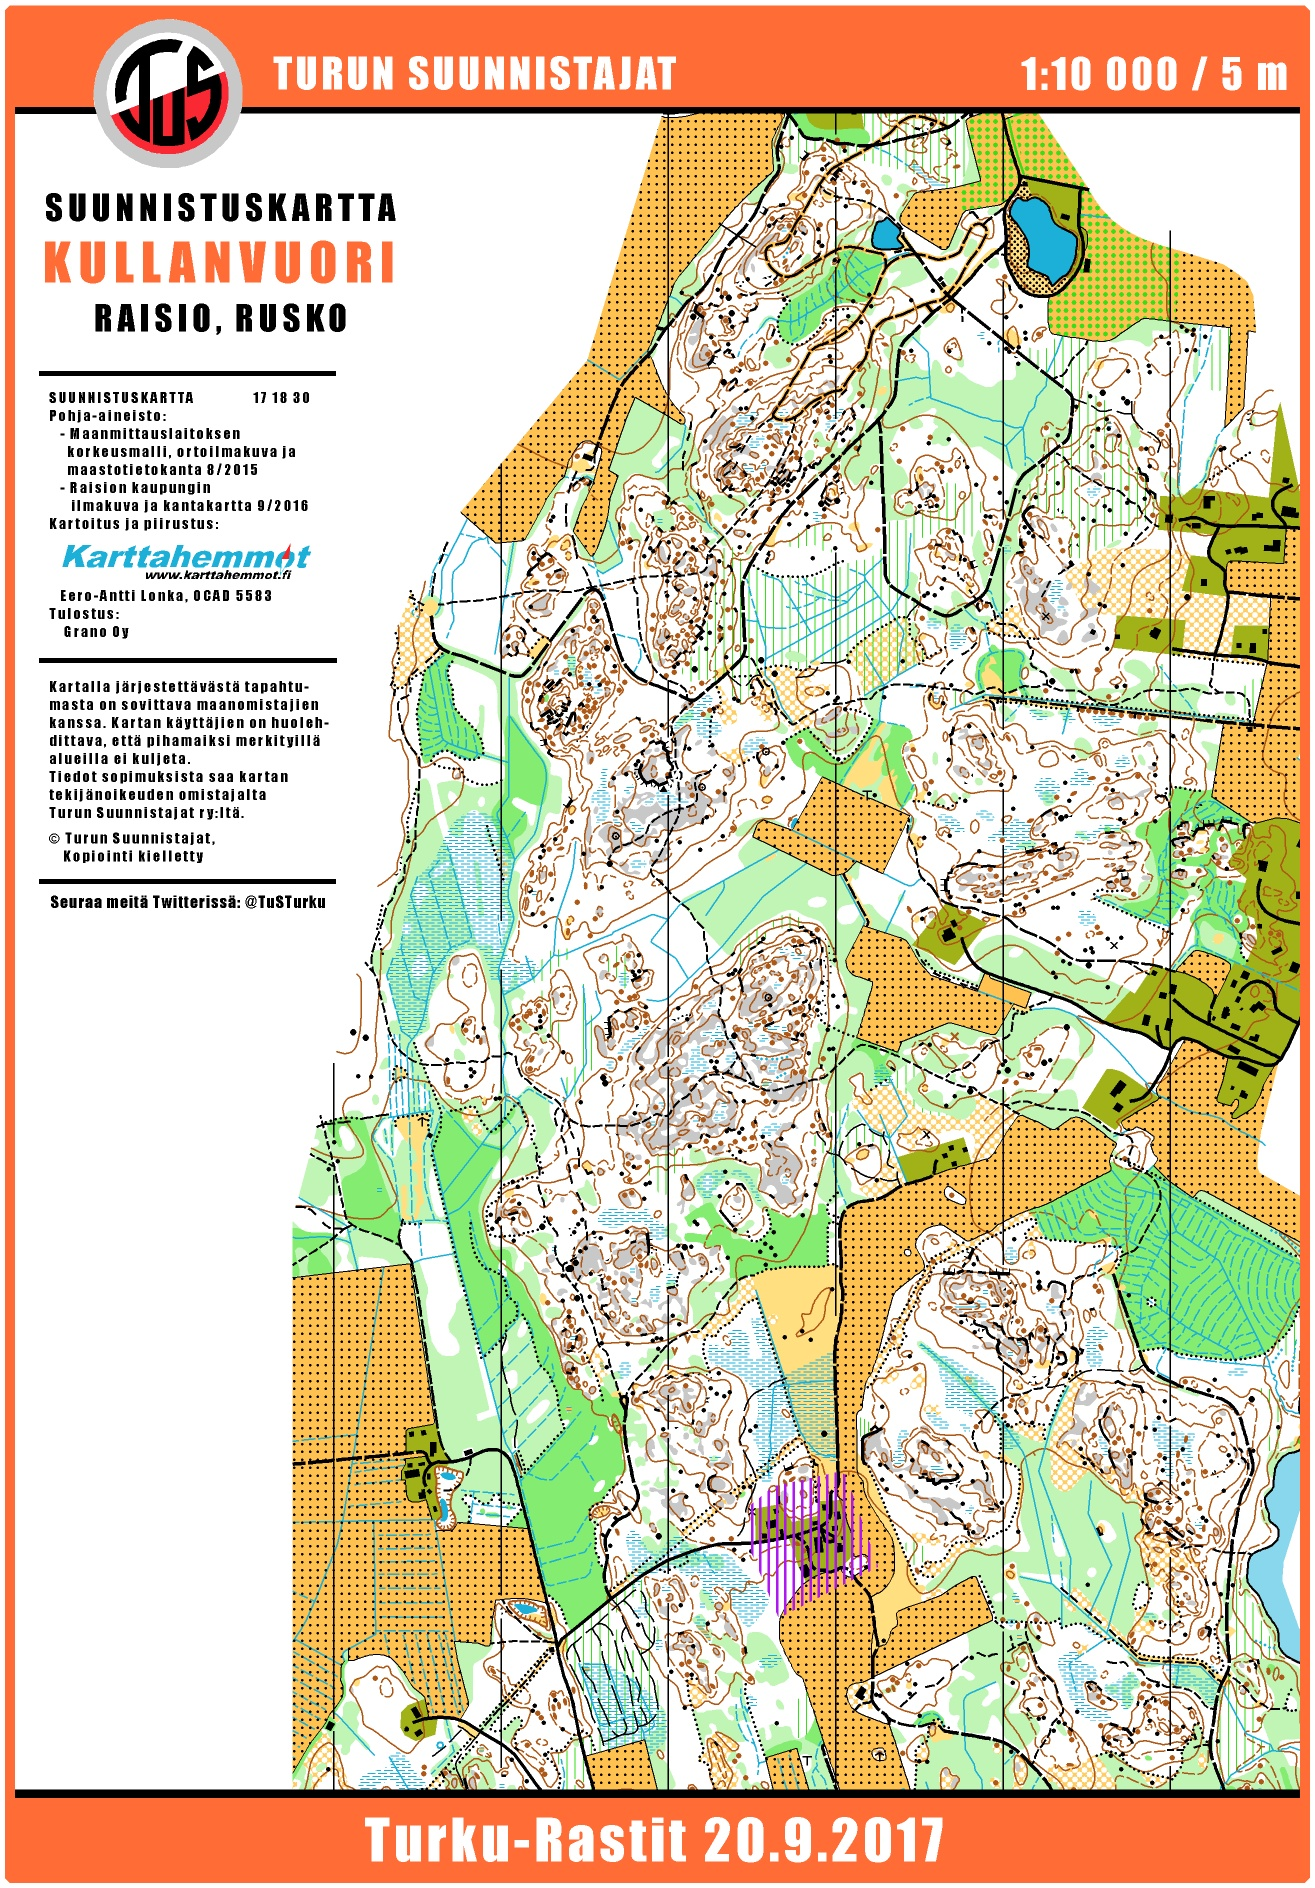 TurkuRastit 2092017 September 20th 2017 Orienteering Map from